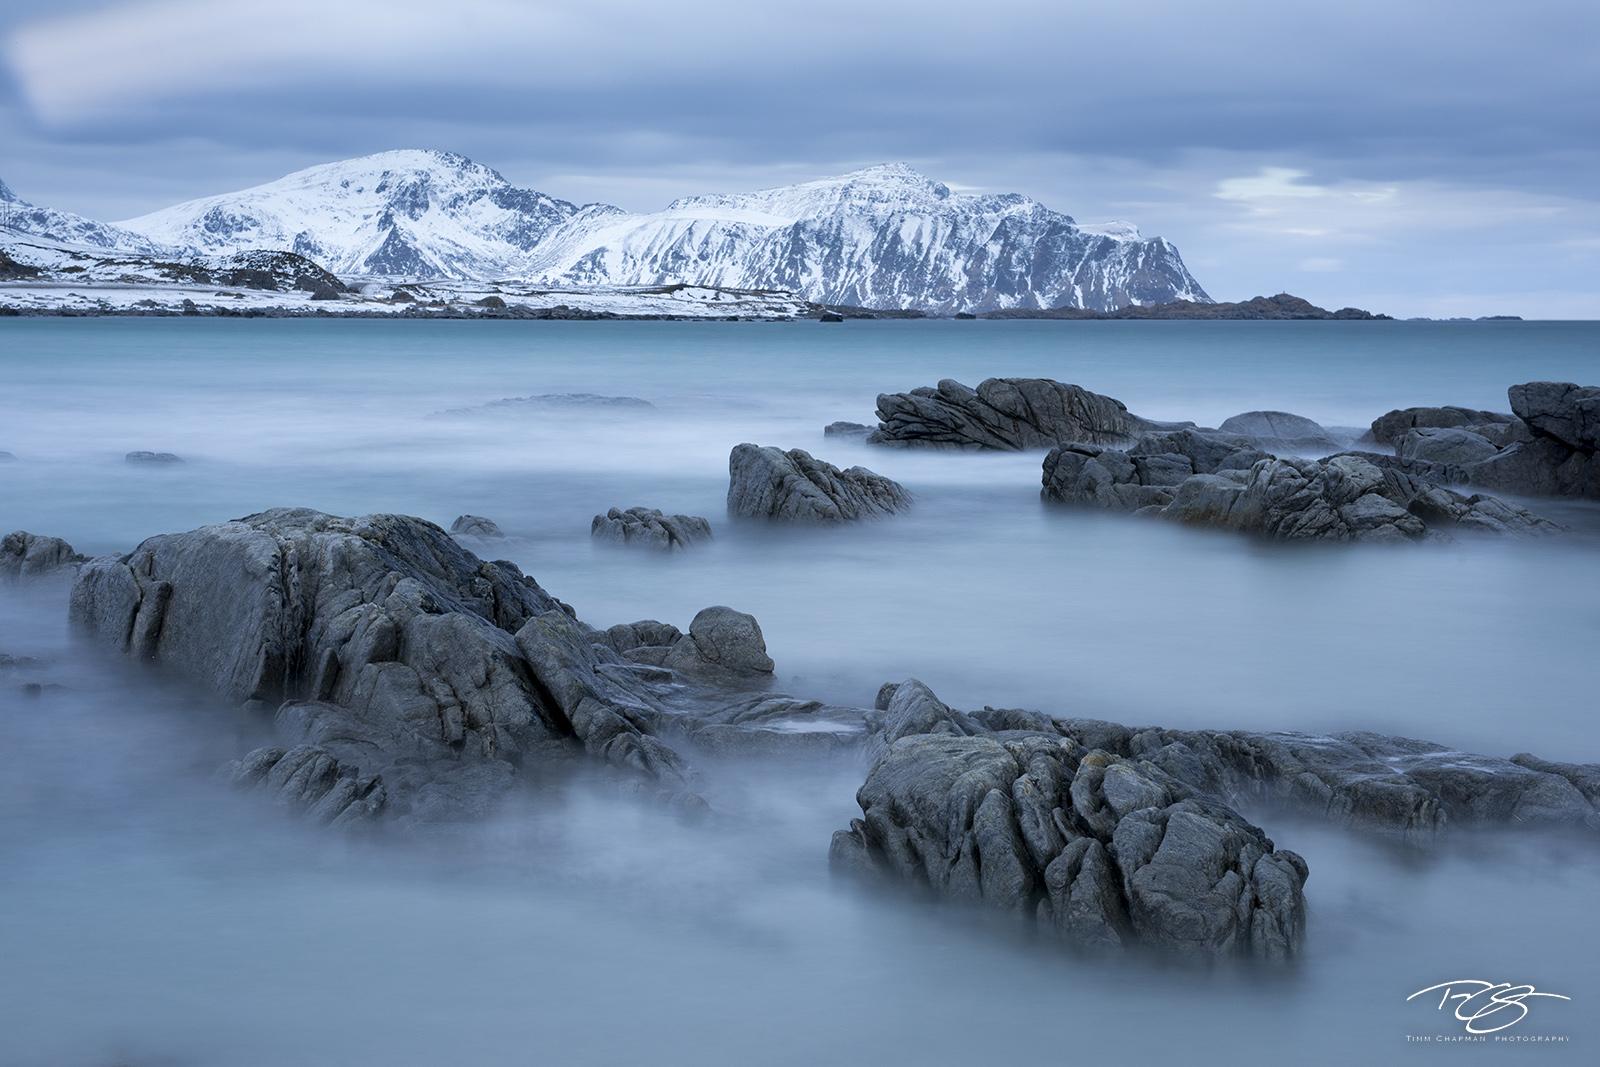 rocks, norway, long exposure, sea, coastline, coast, beach, arctic, lofoten, boulders, norwegian sea, calm, peace, tranquility, resilience, strength, photo